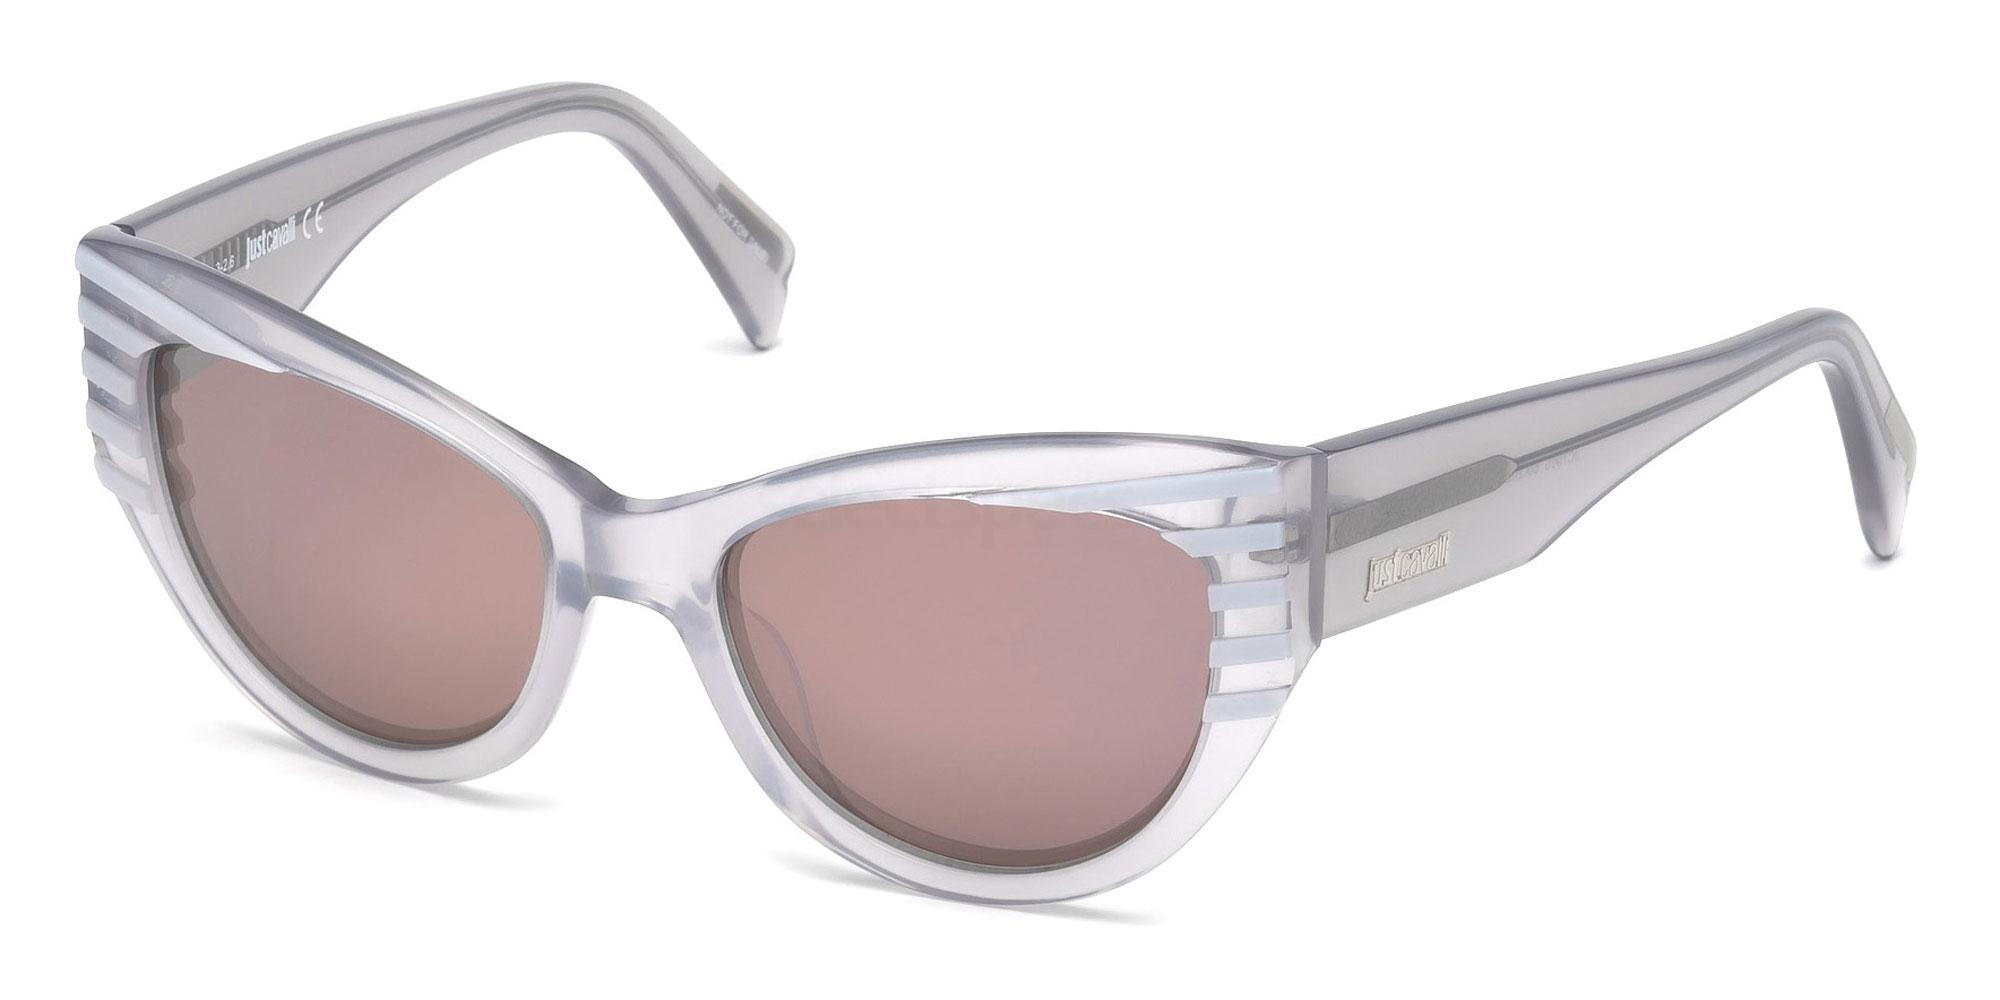 20Z JC790S Sunglasses, Just Cavalli